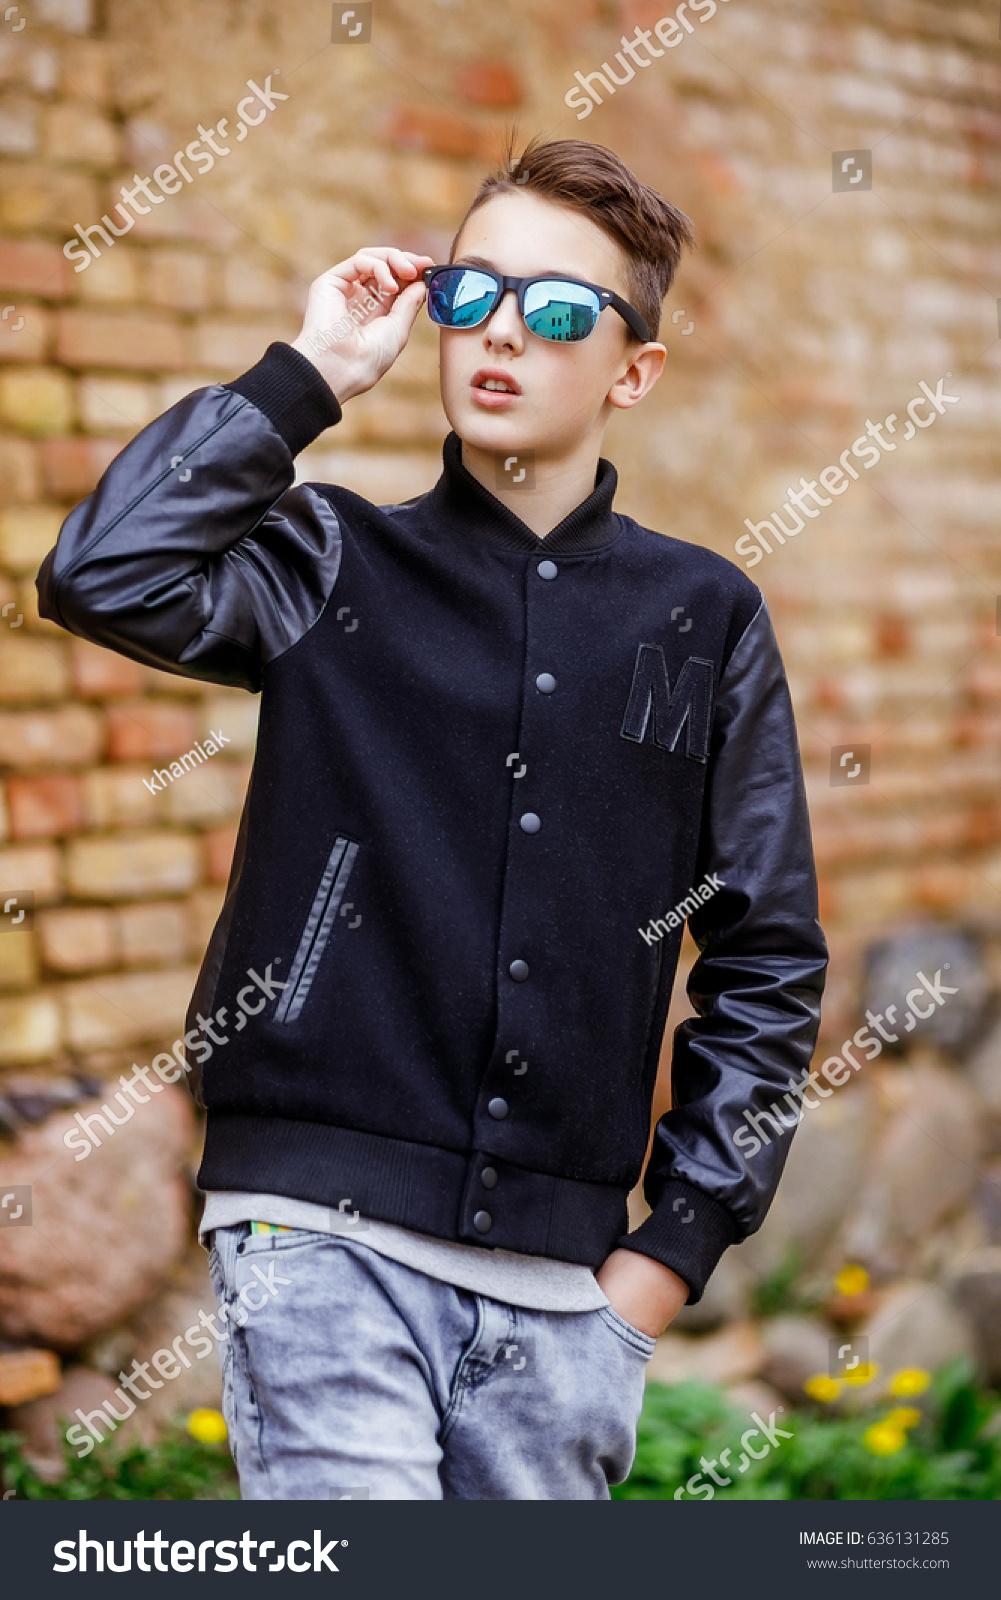 Teen walking around